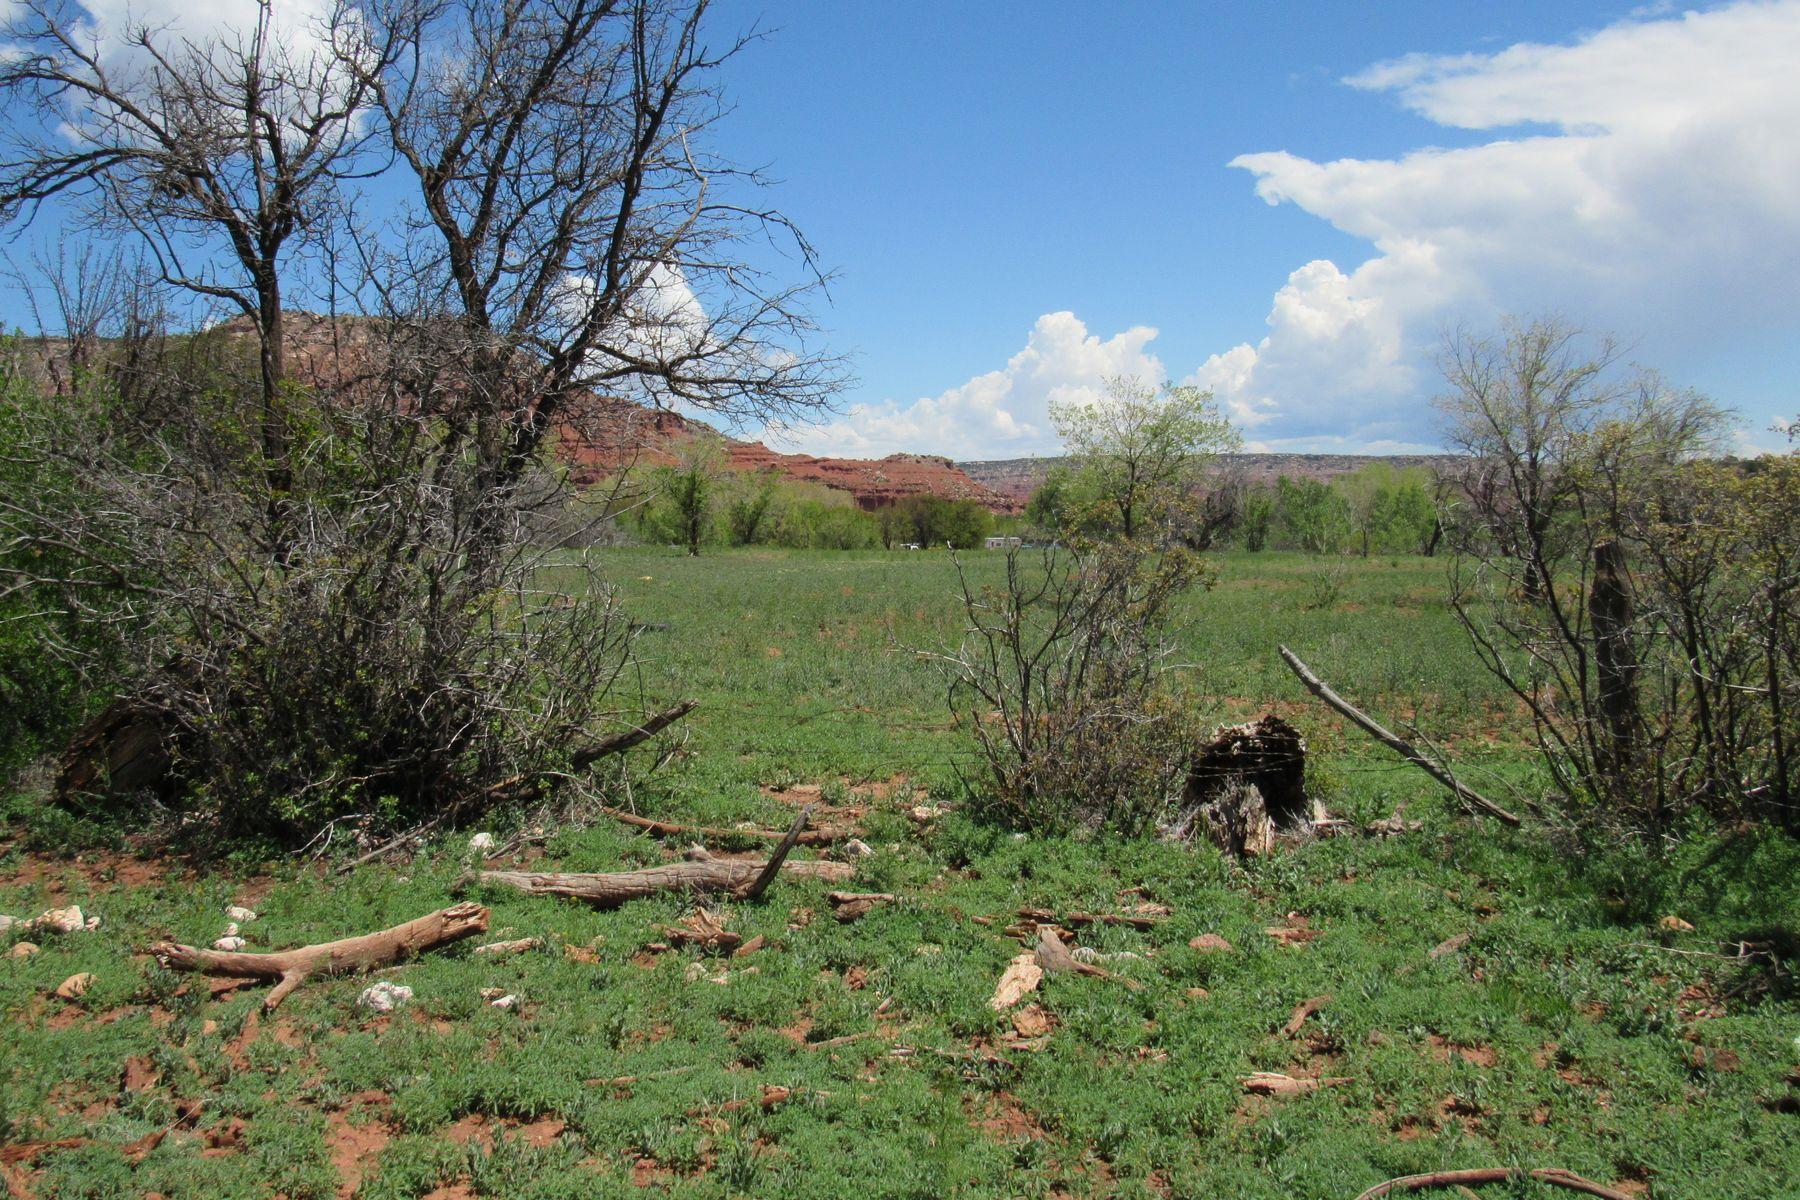 أراضي للـ Sale في Coyote, New Mexico 87012 United States